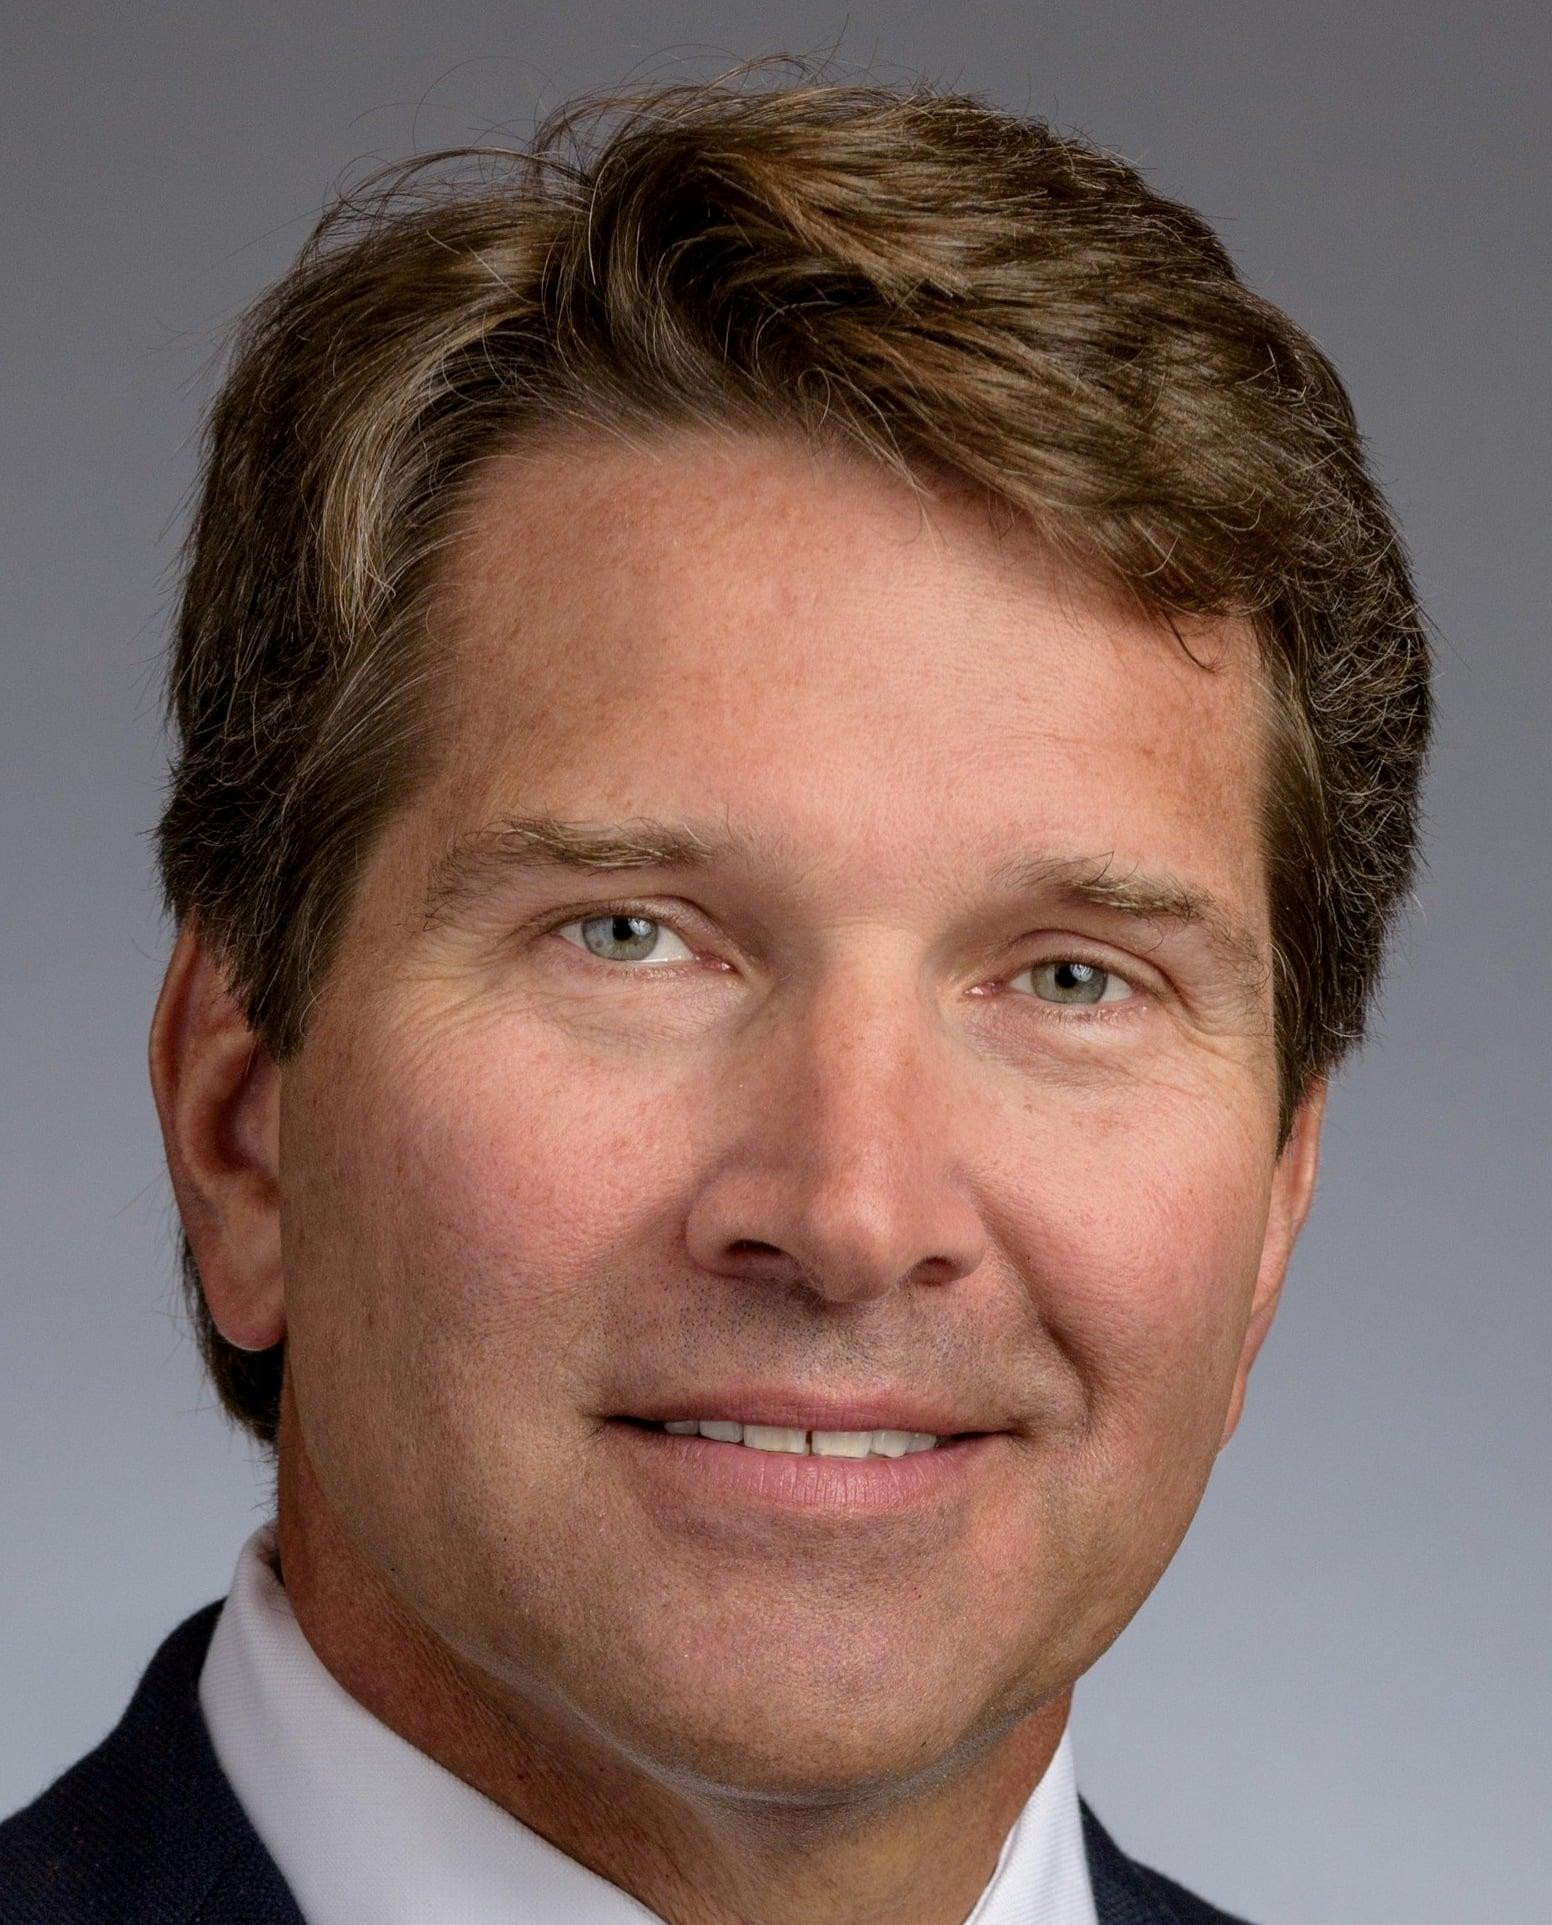 Dr. John S Alspaugh MD